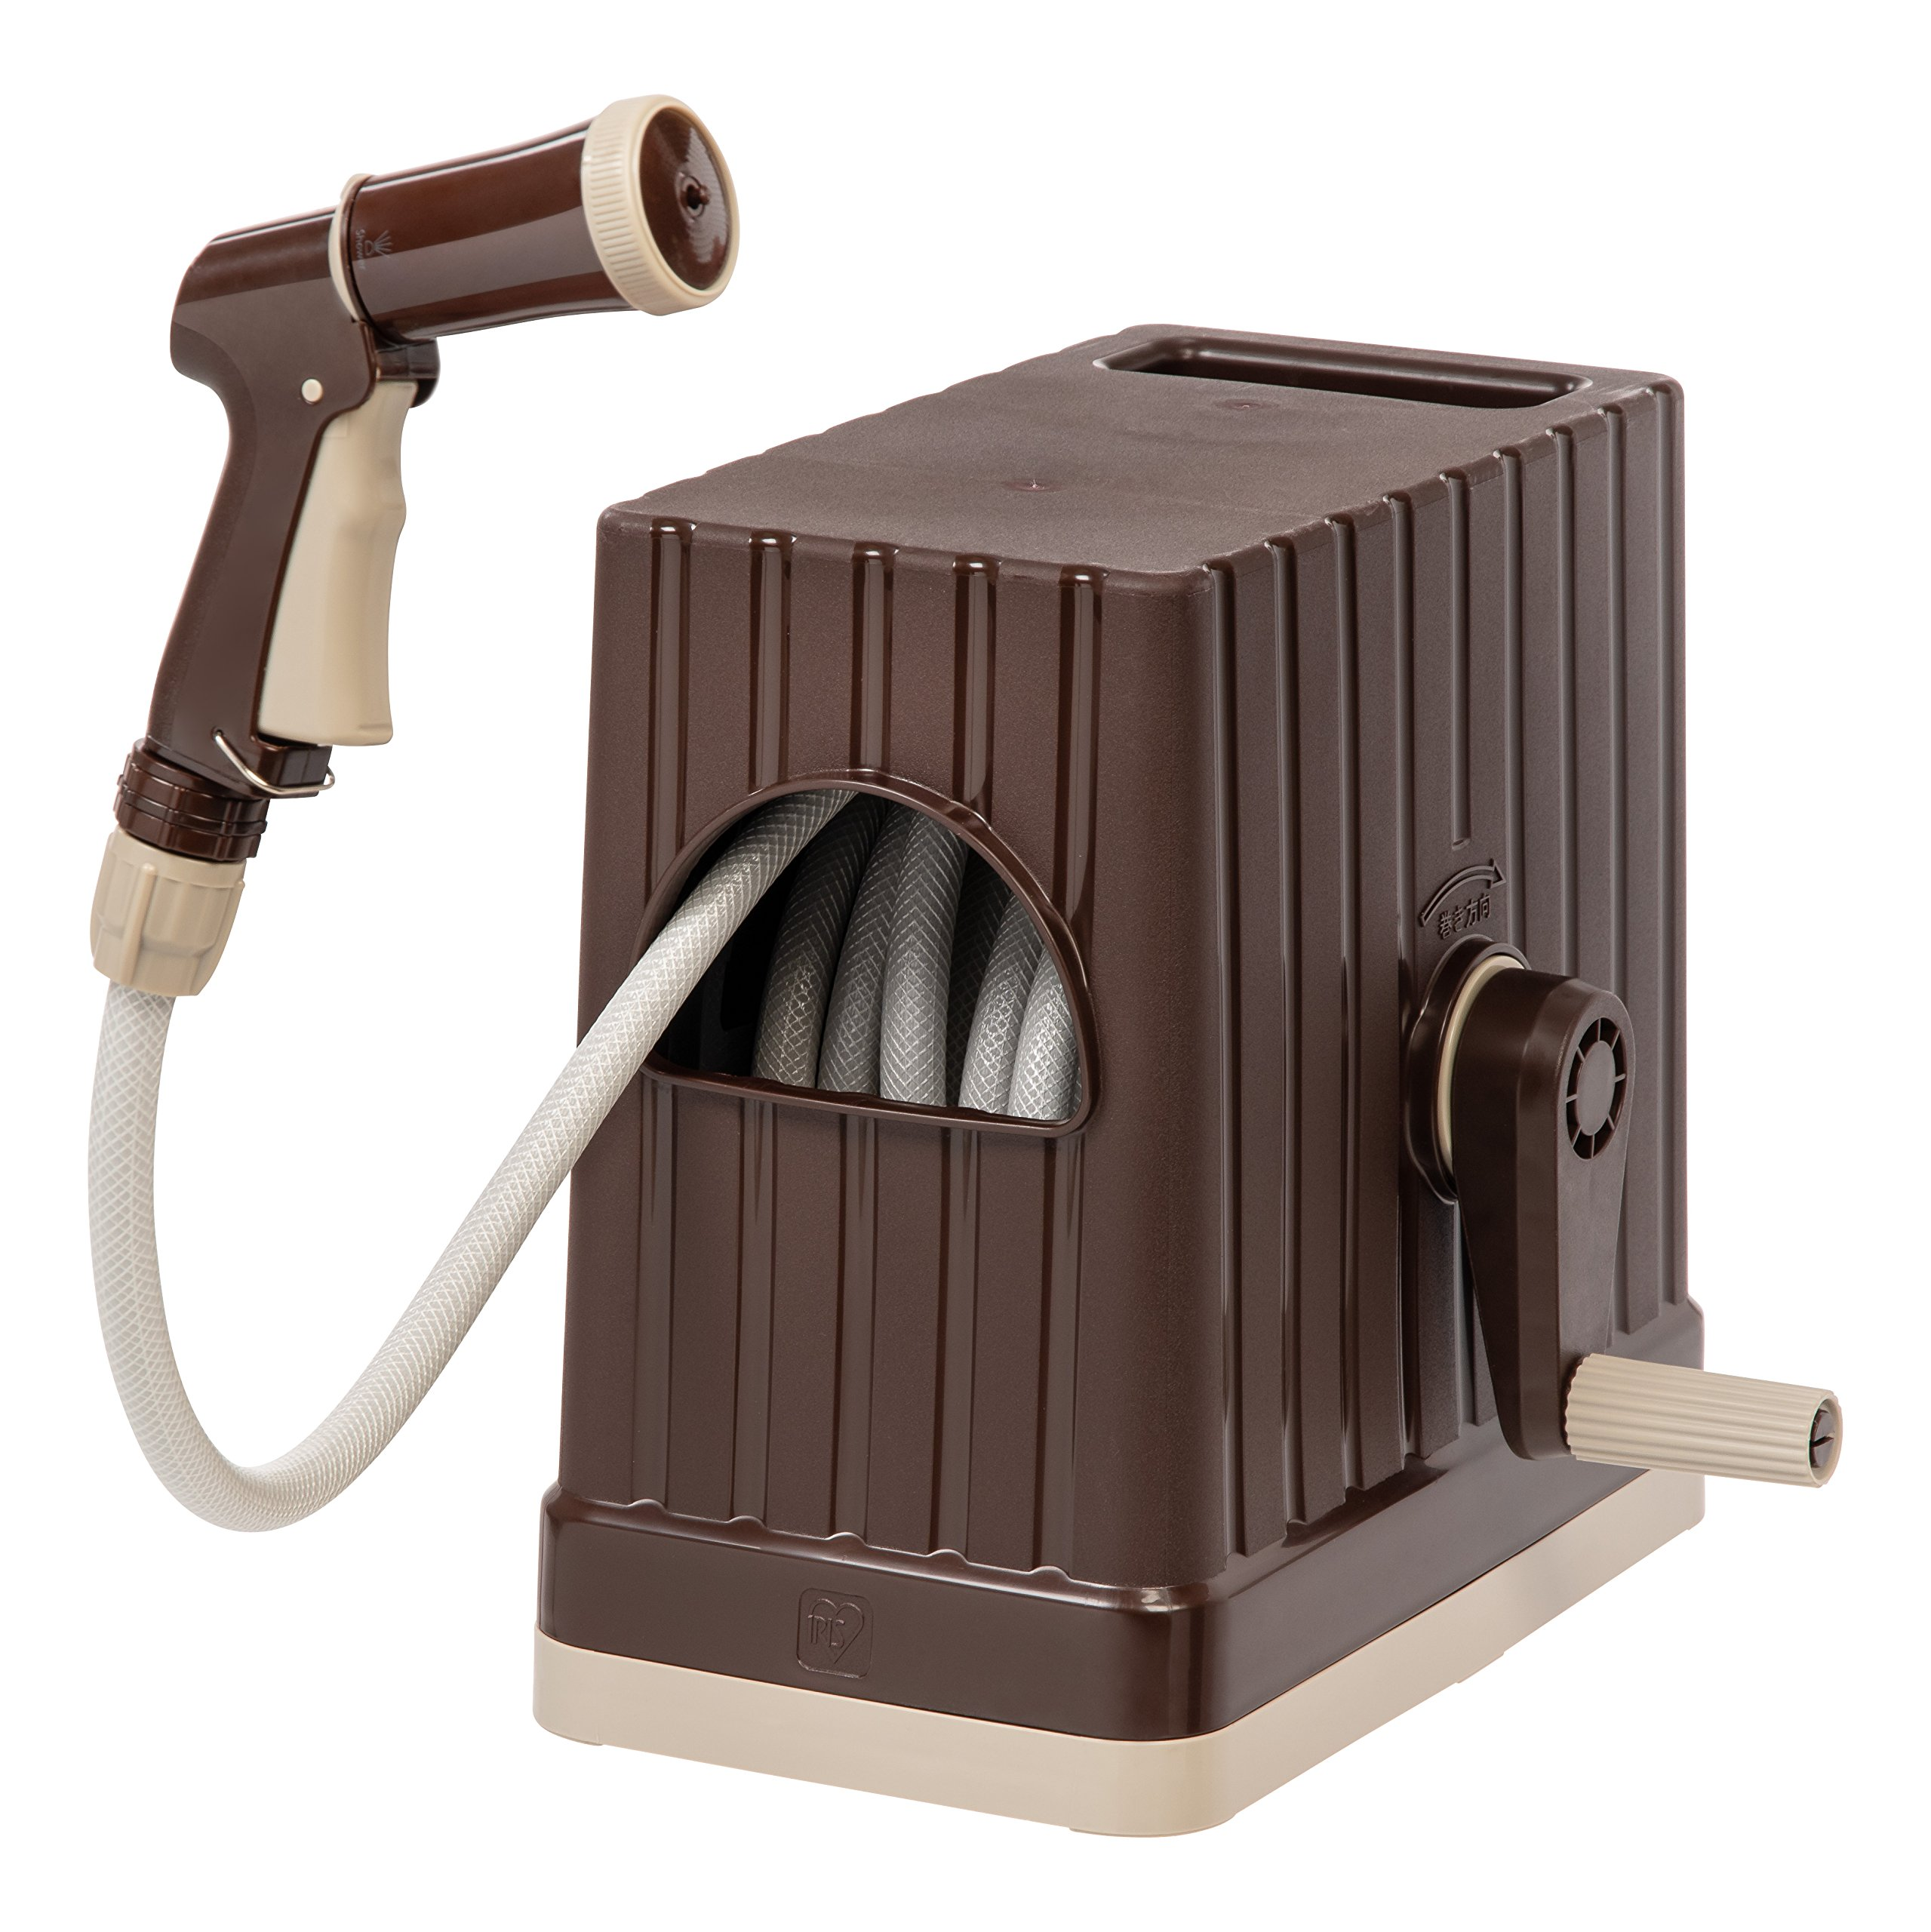 IRIS USA, Inc. FHEX-15 Hose Reel Set, Hose with Nozzle, 48 ft, Brown